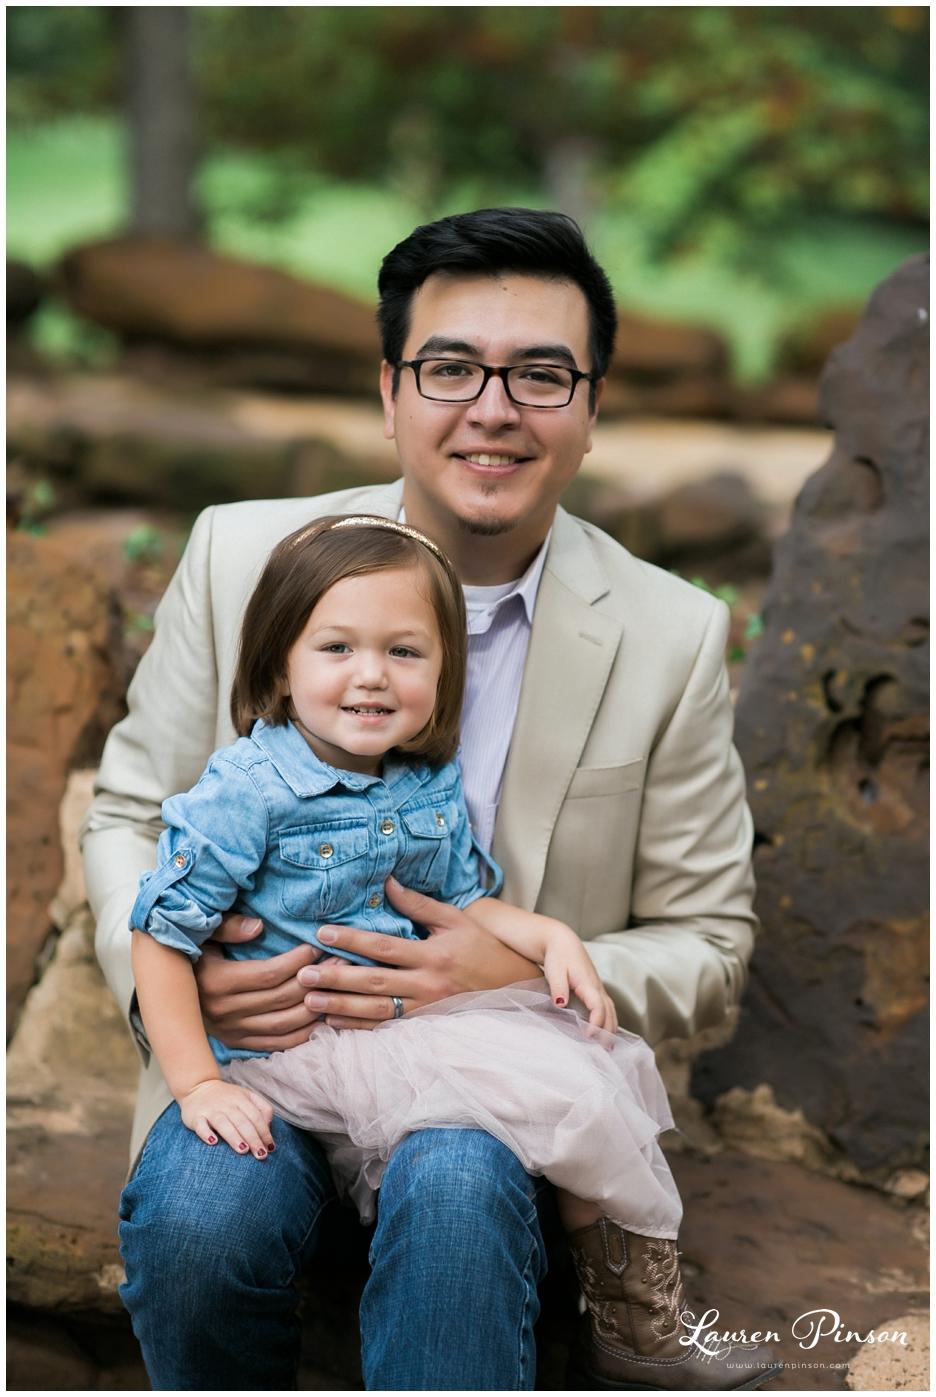 wichita-falls-child-family-portrait-photographer_1287.jpg